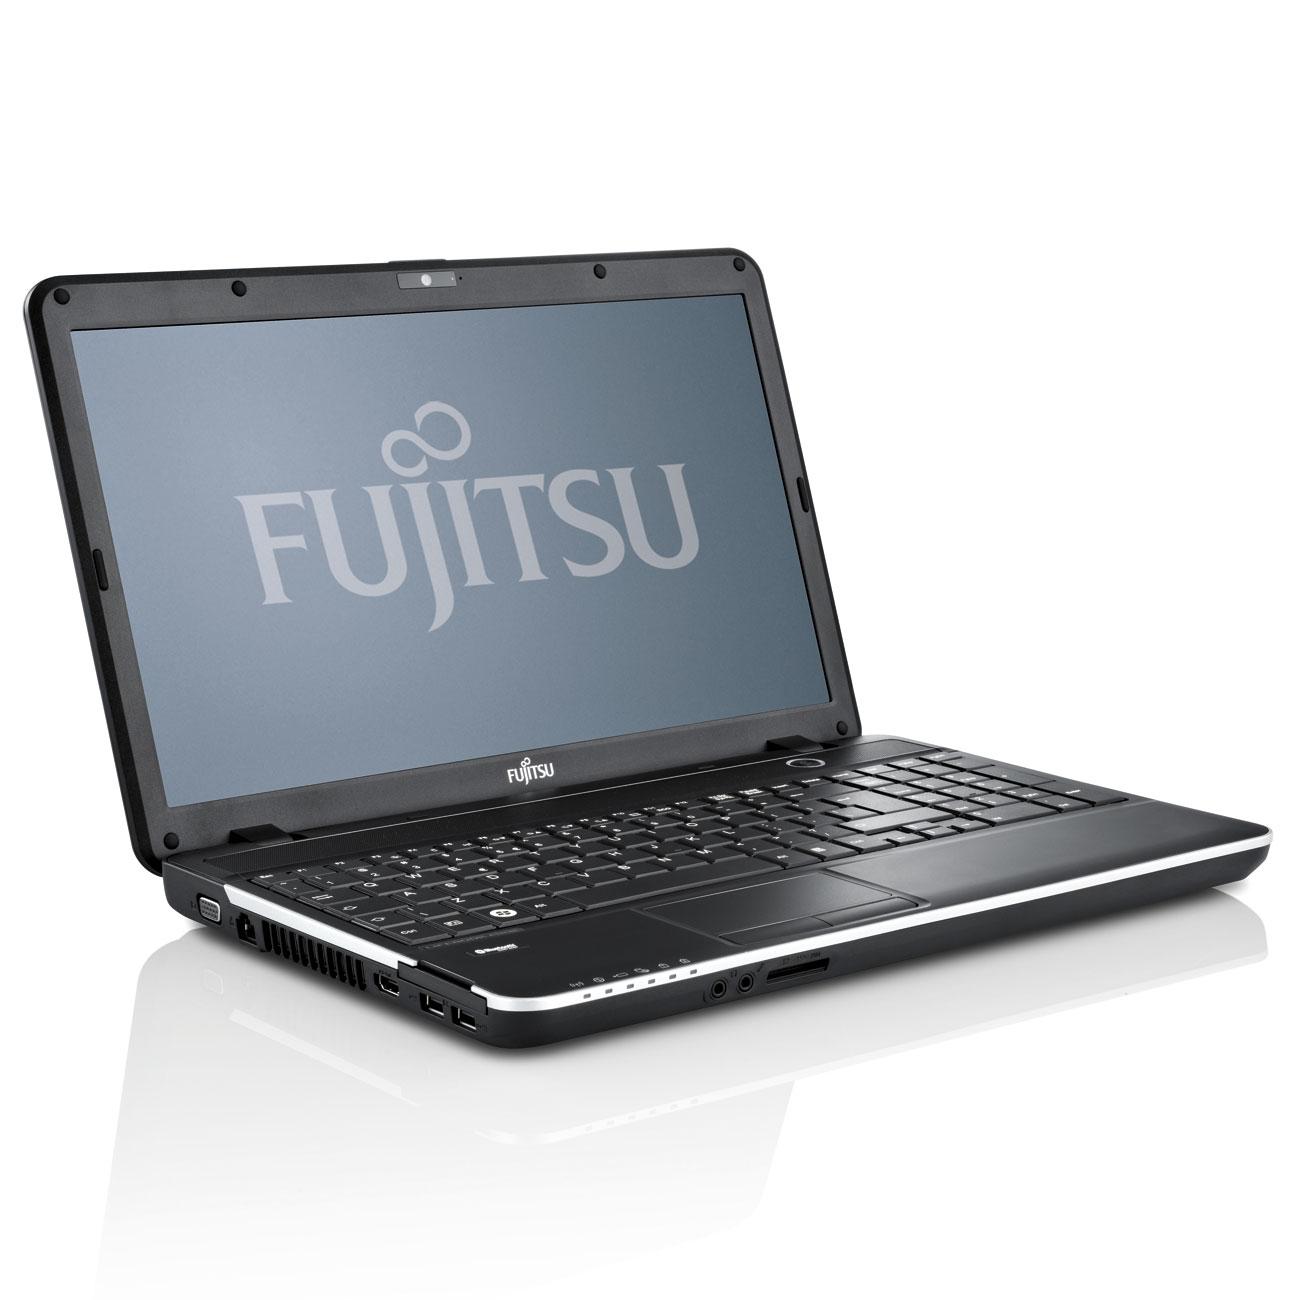 fujitsu lifebook a512 vfy a5120m7311fr vfy a5120m7311fr. Black Bedroom Furniture Sets. Home Design Ideas